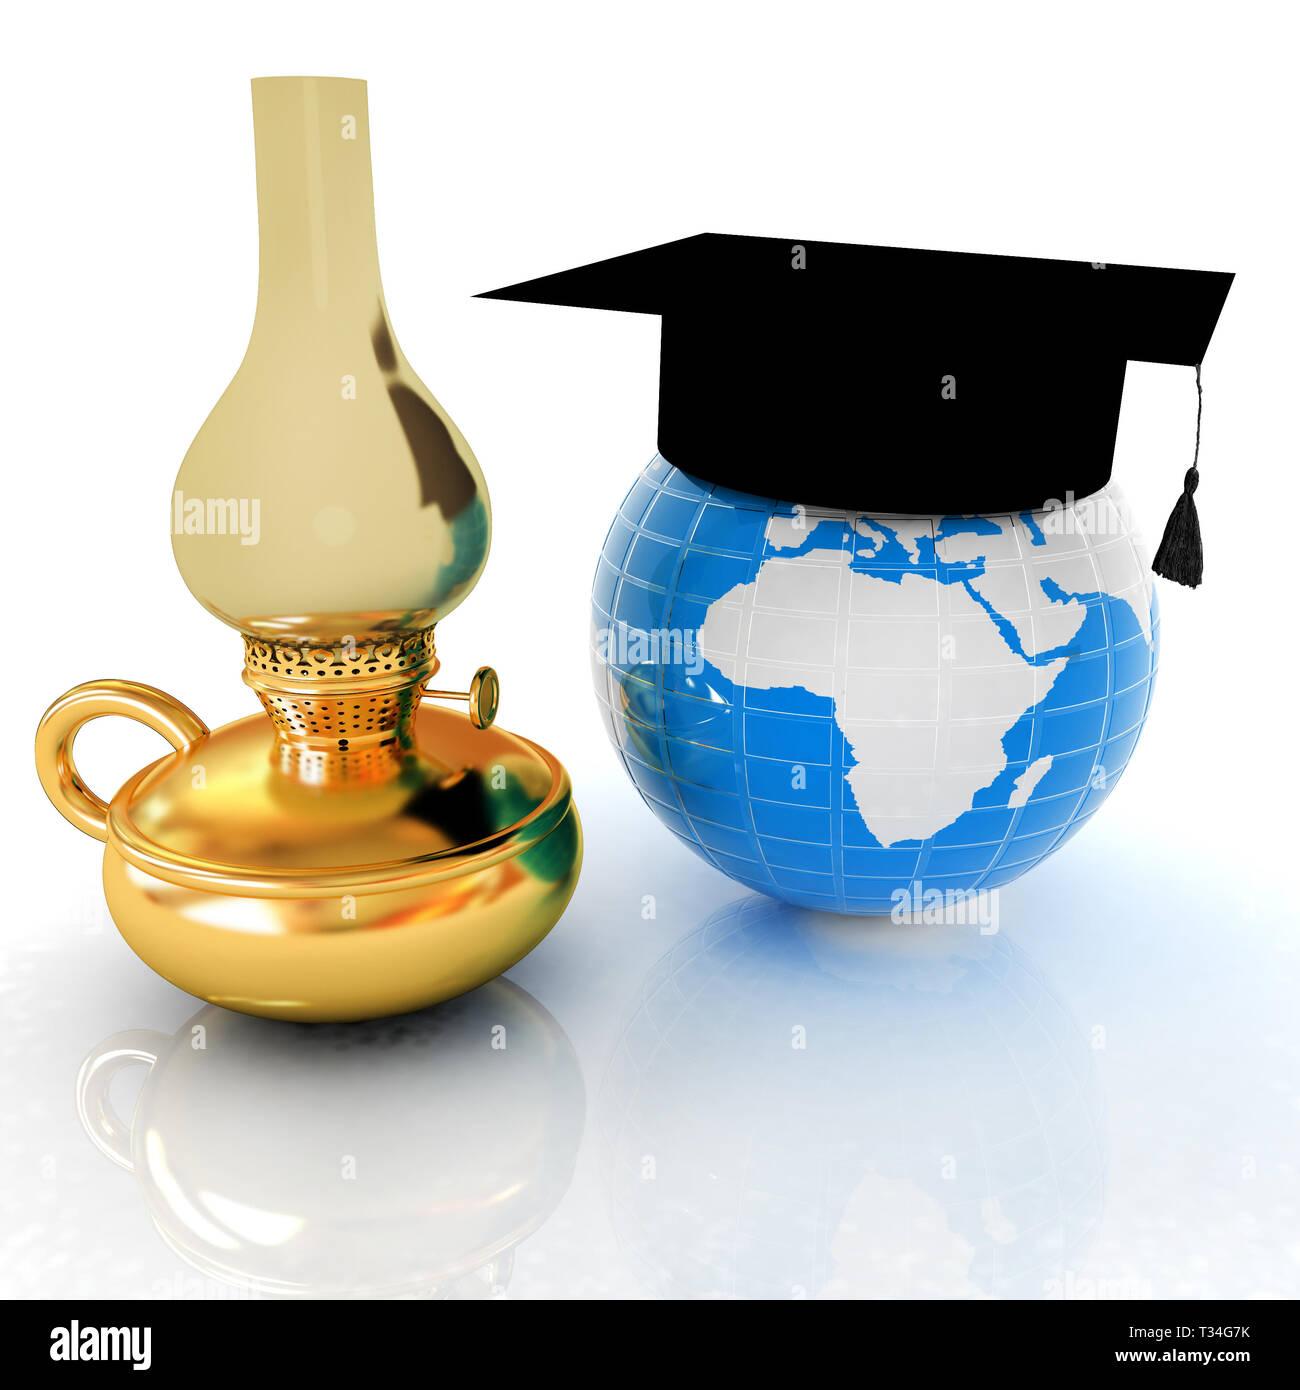 Earth, kerosene lamp and graduation hat. 3d render - Stock Image